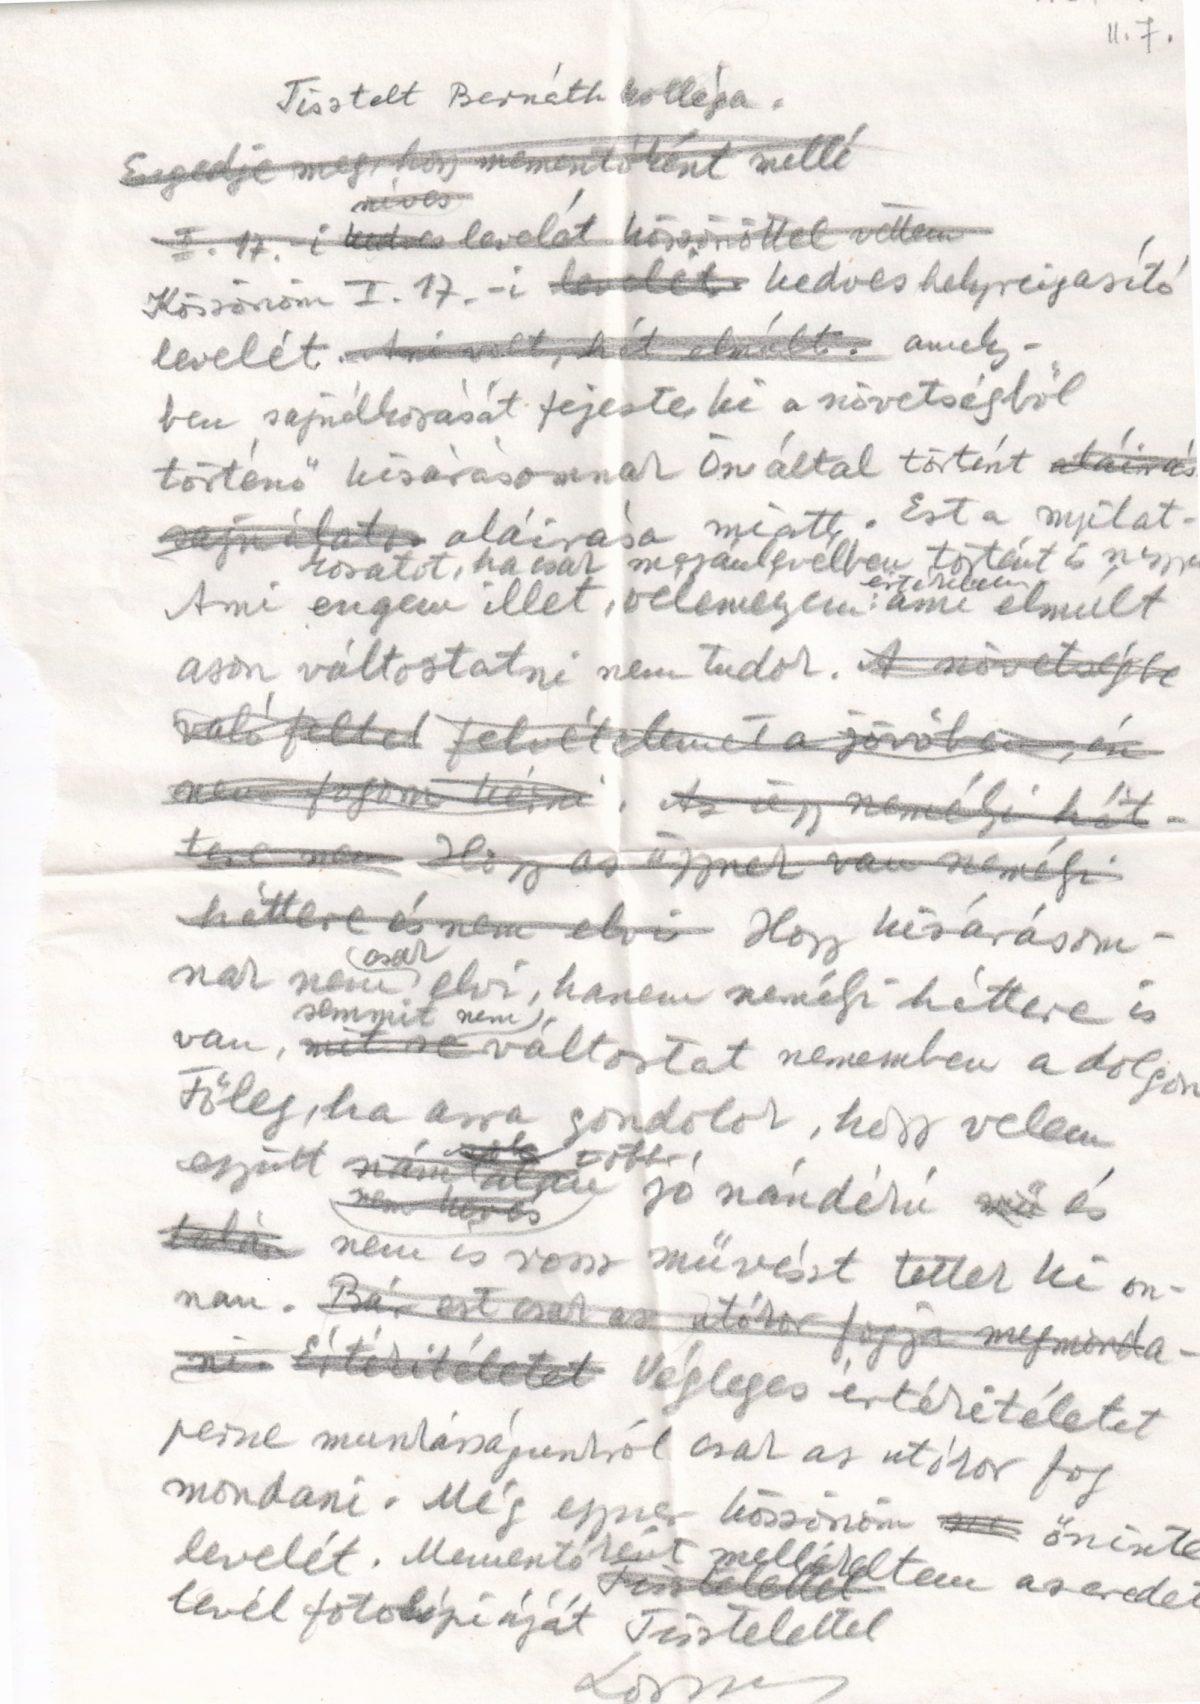 1971-02-07 L.T. Bernáth Aurélnak